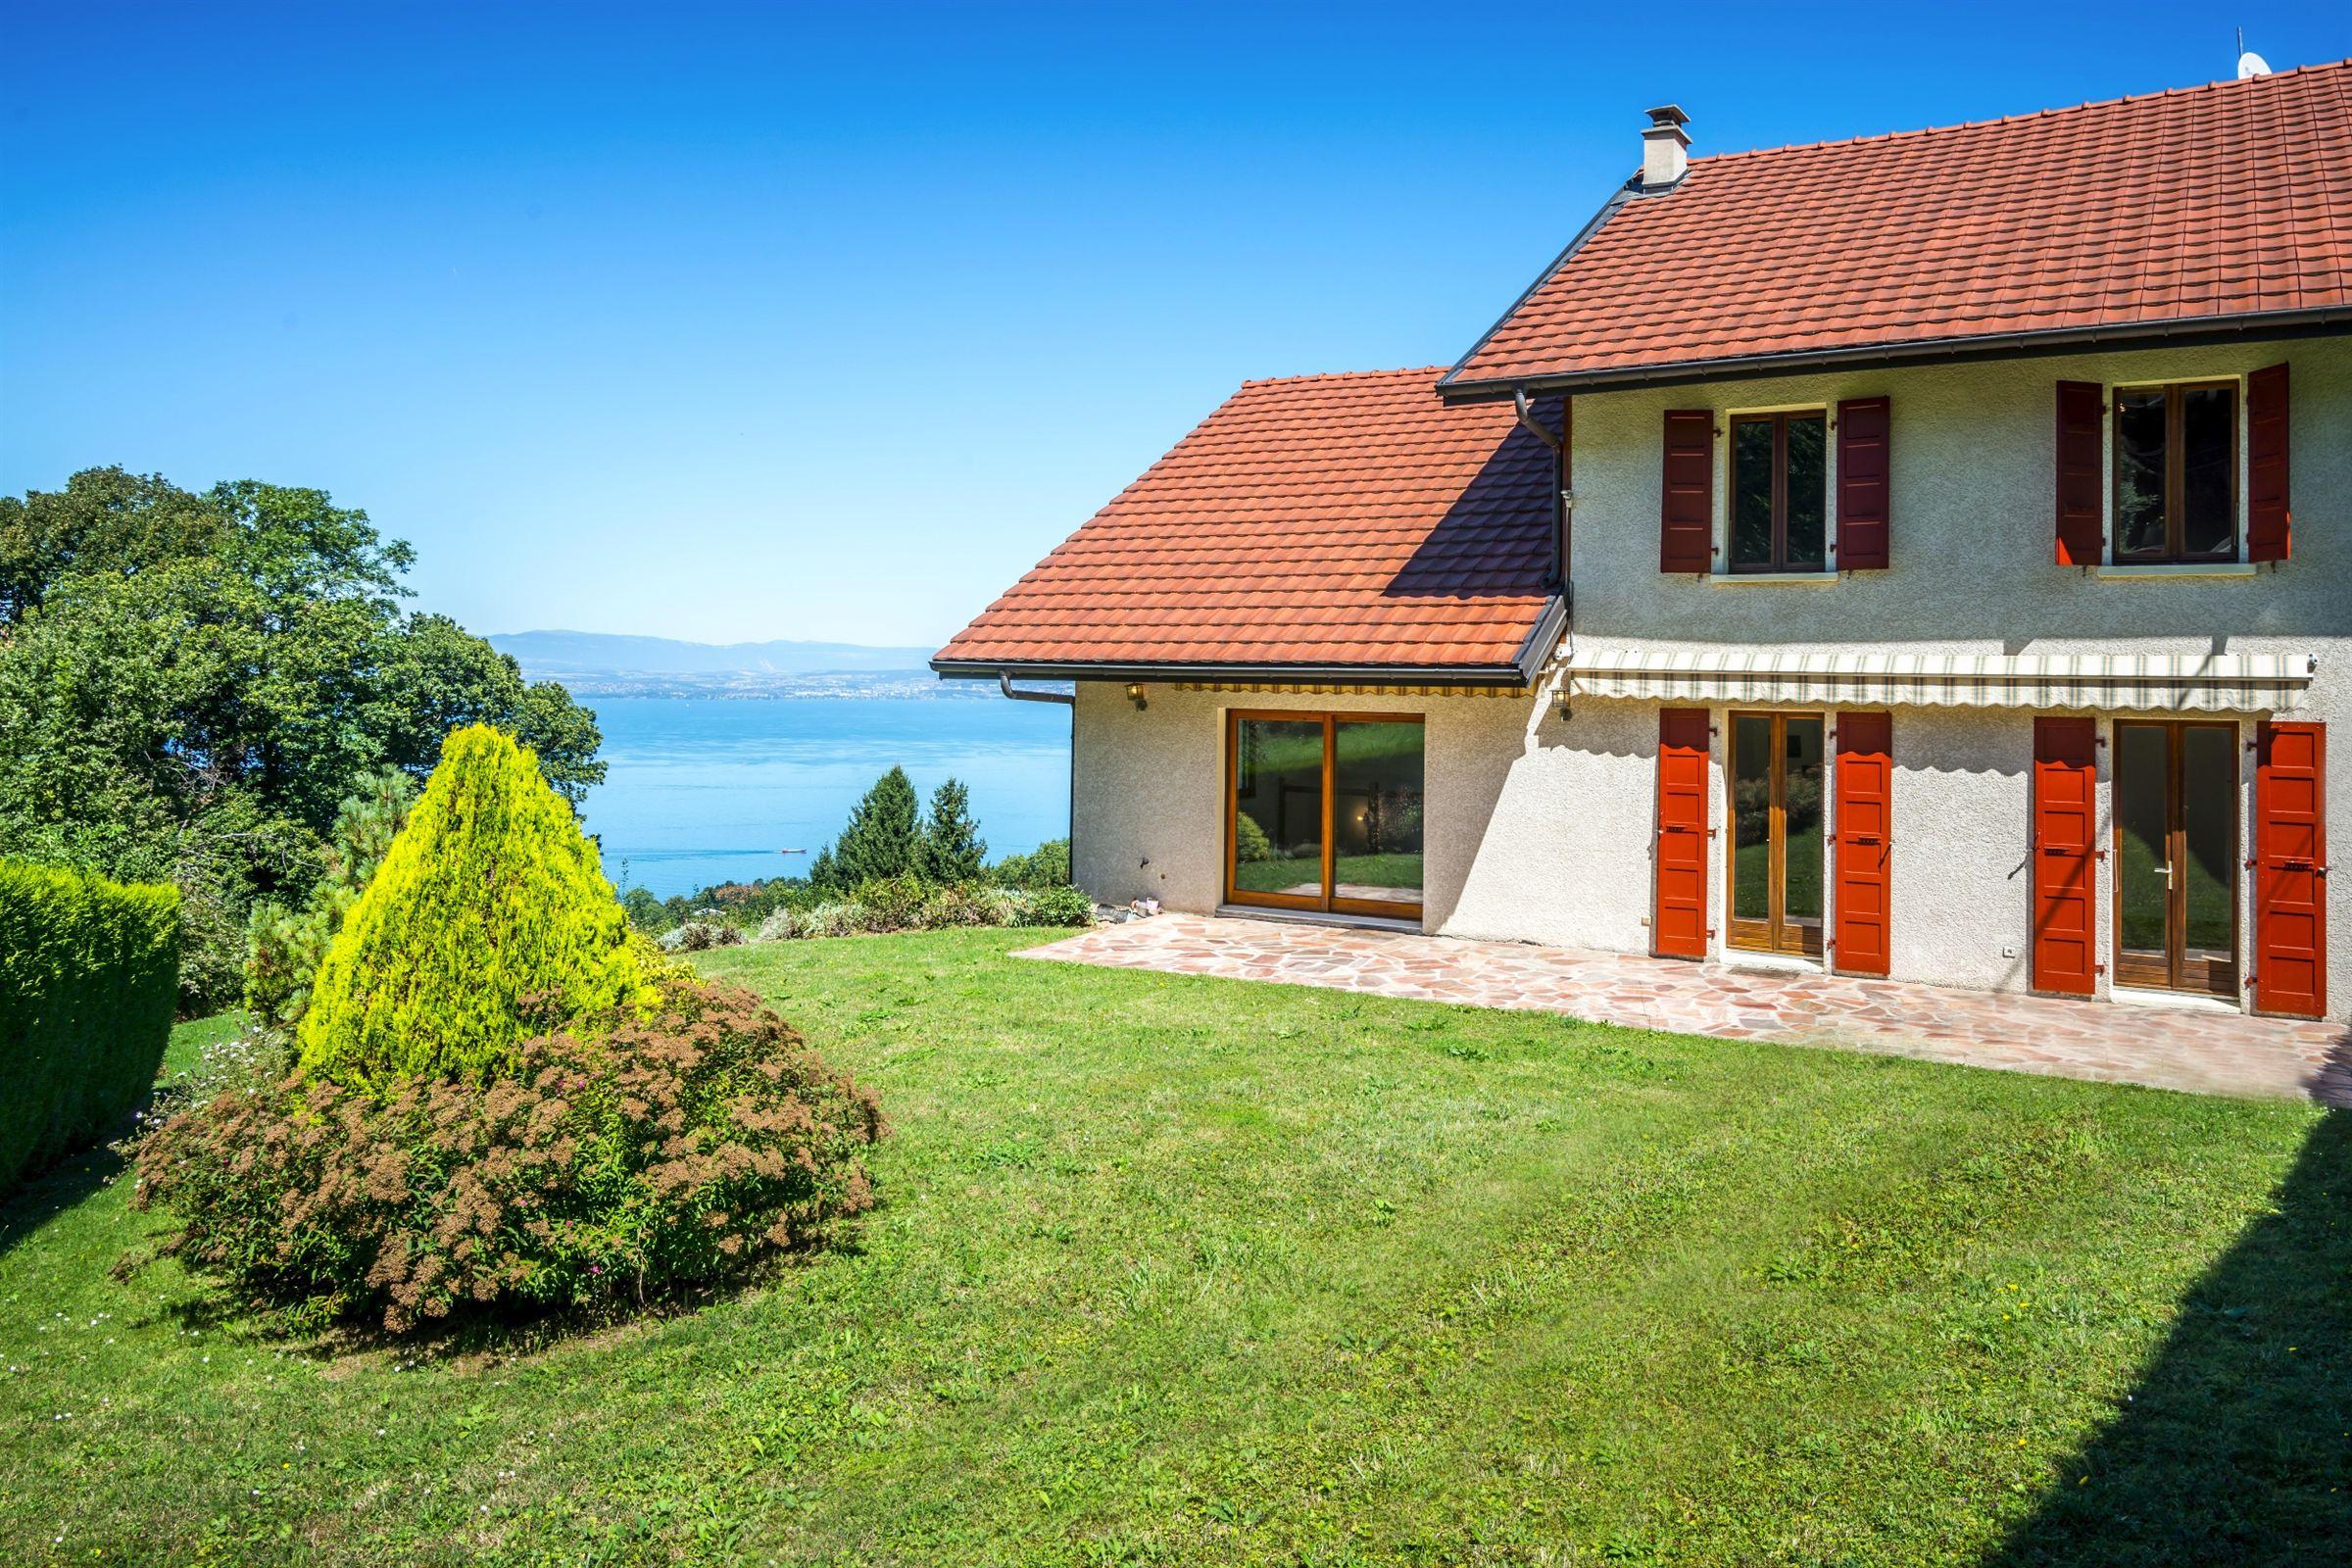 Single Family Home for Sale at TRES BELLE VUE PANORAMIQUE Publier, Rhone-Alpes, 74500 France